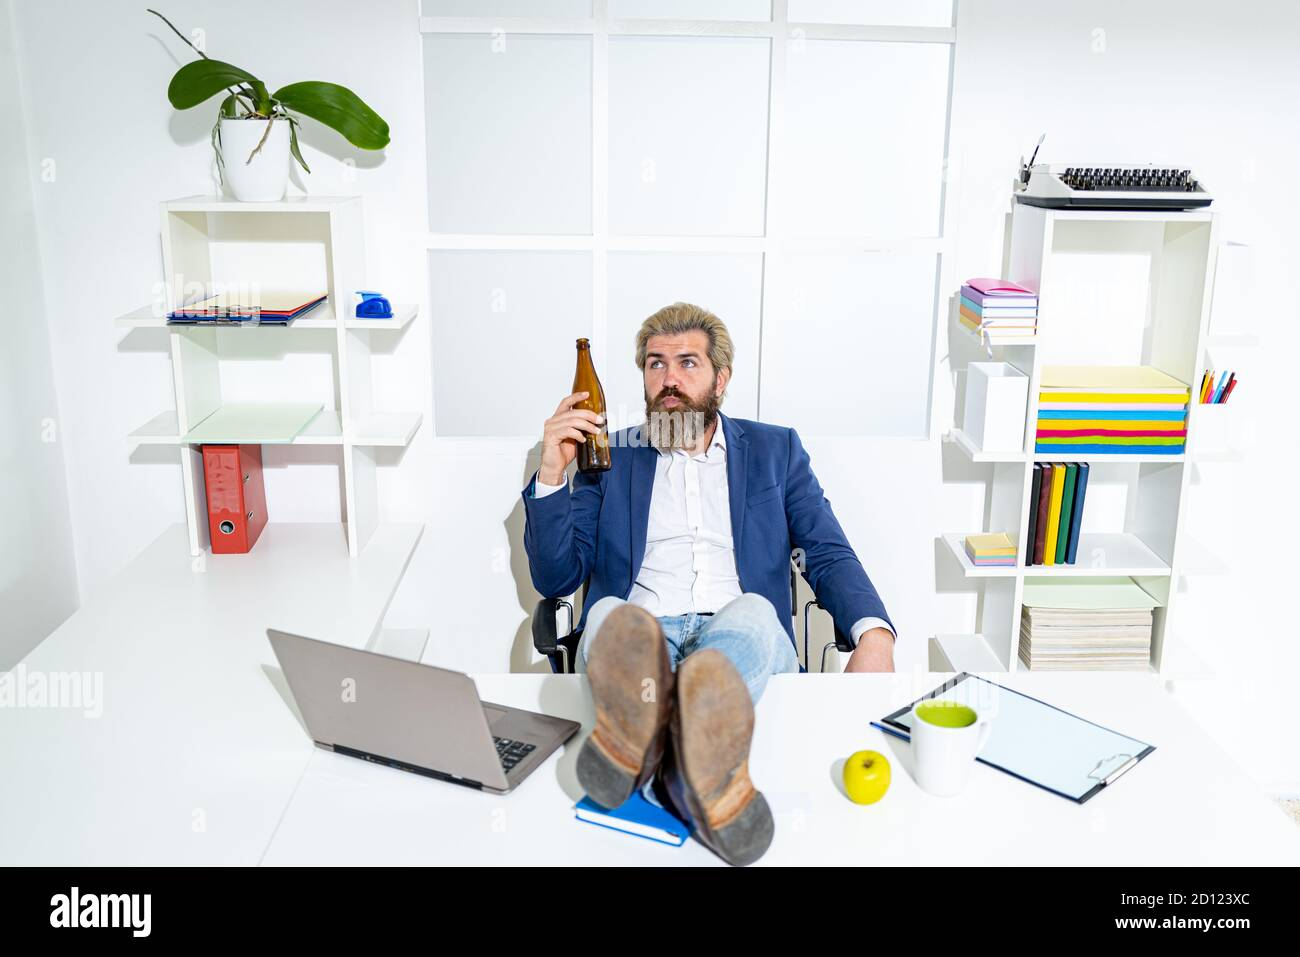 Sad office worker desperate about unfair dismissal losing job. After hard work. Businessman hold a beer bottle. Stock Photo